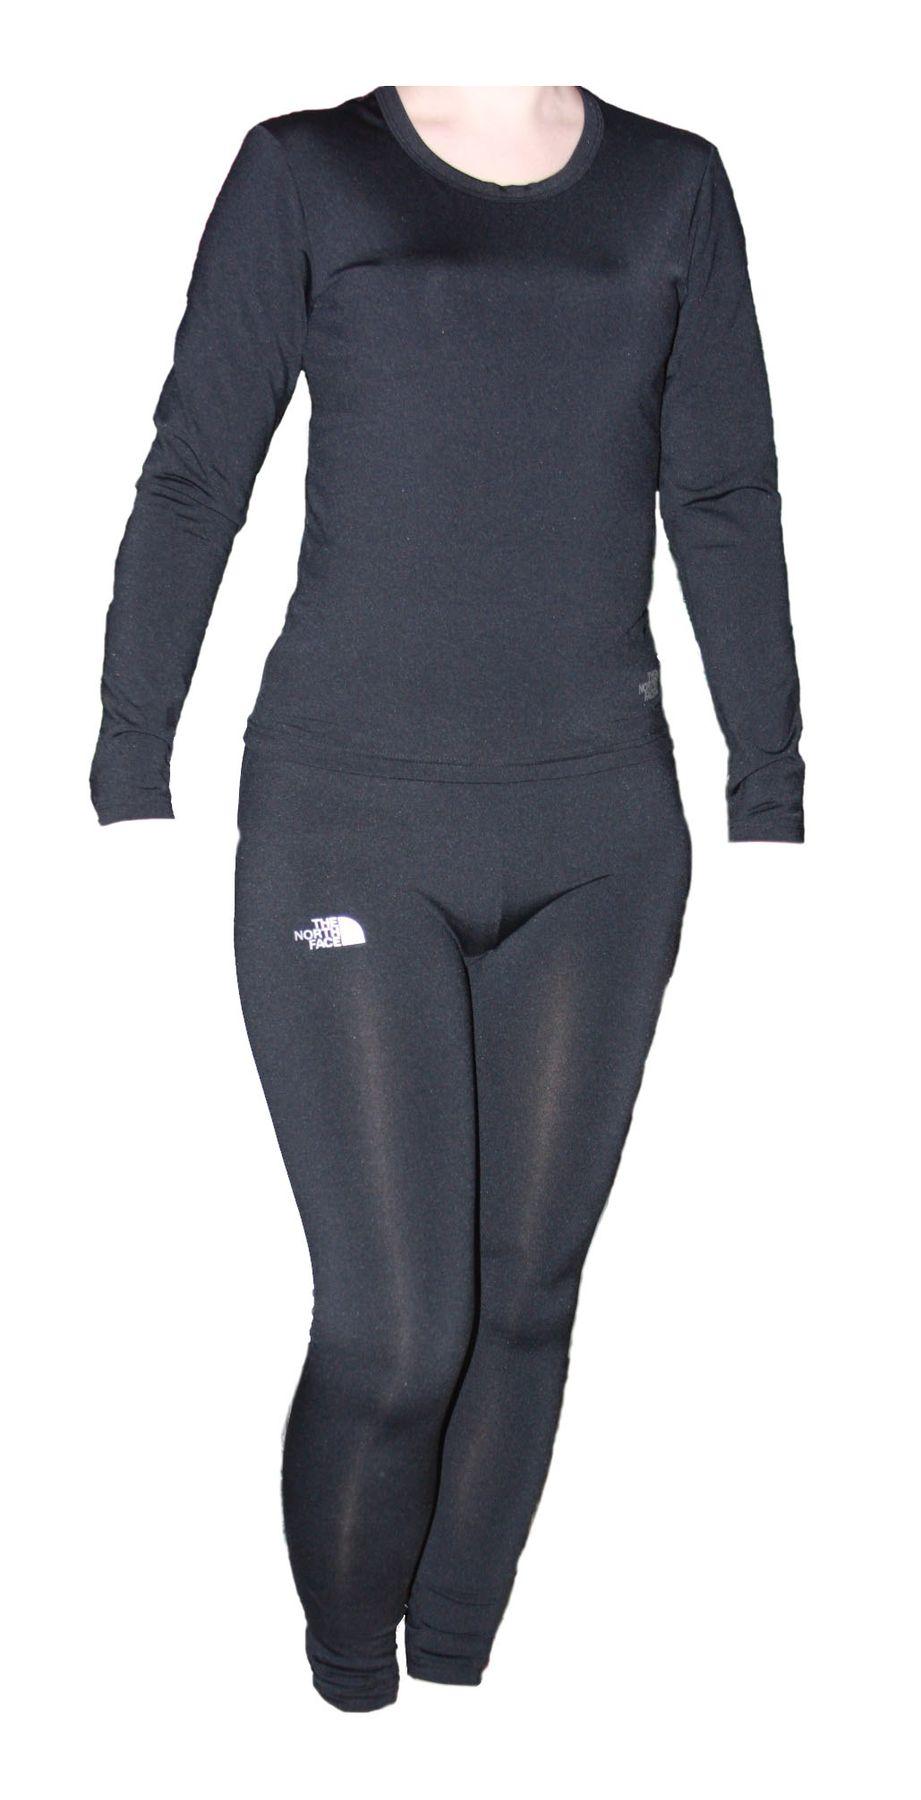 81684dcee212e Комплект термобелья женского The North Face (рубашка + кальсоны ...